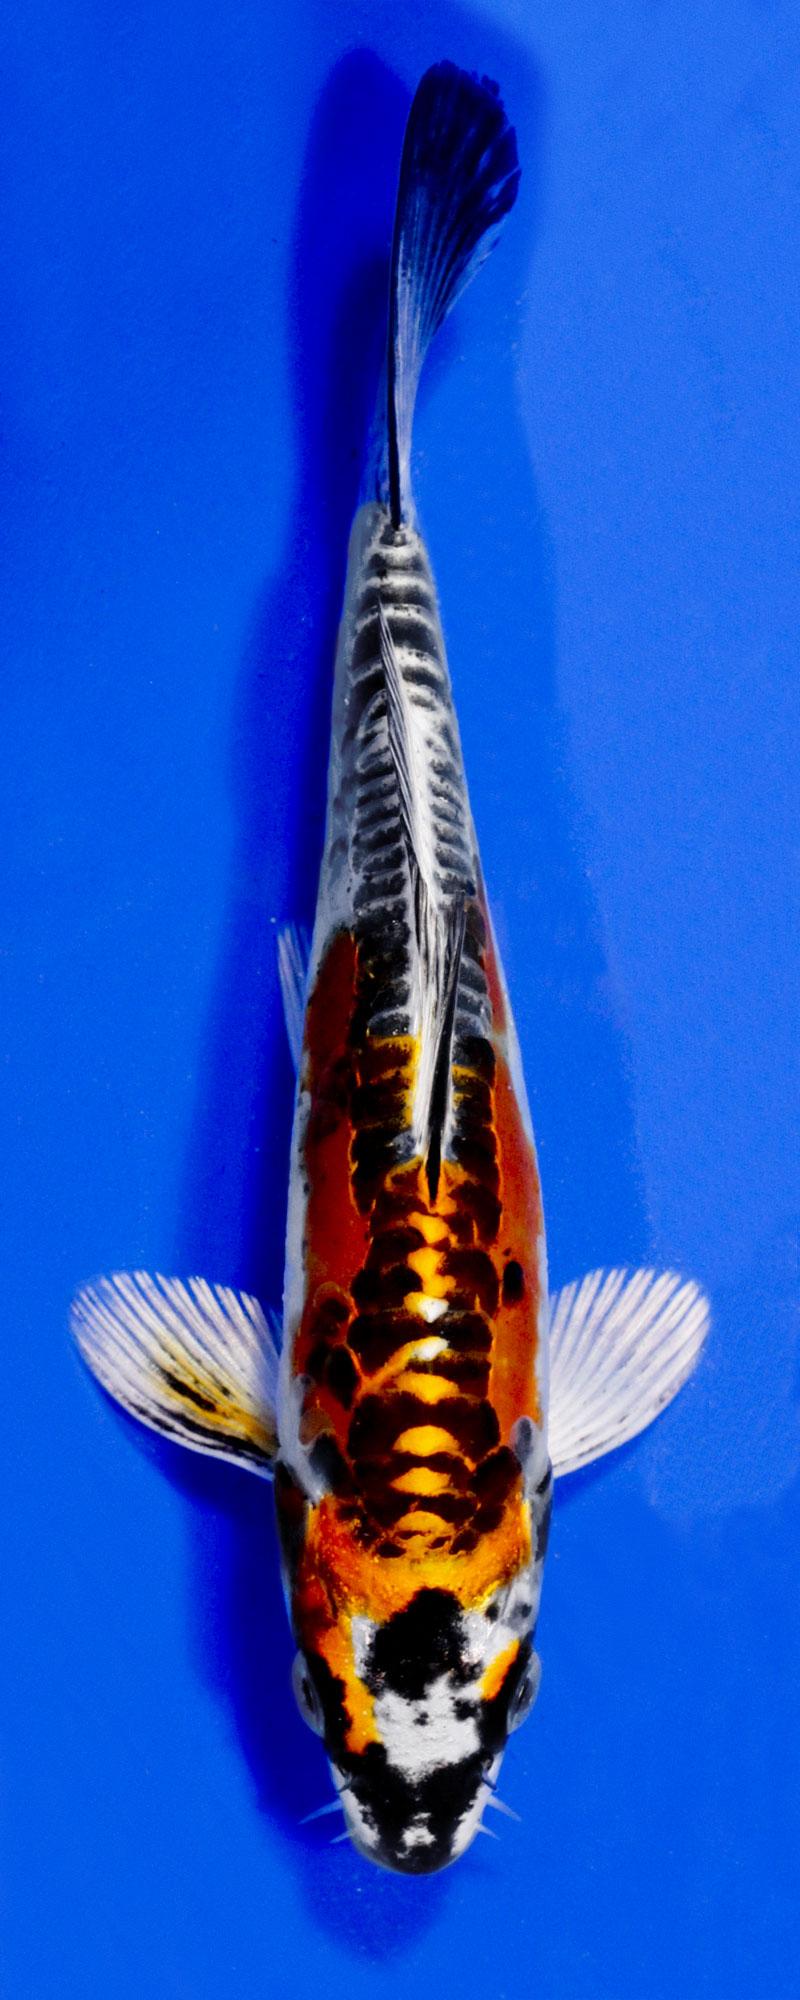 Koi variety guide blue ridge fish hatchery for Blue ridge fish hatchery